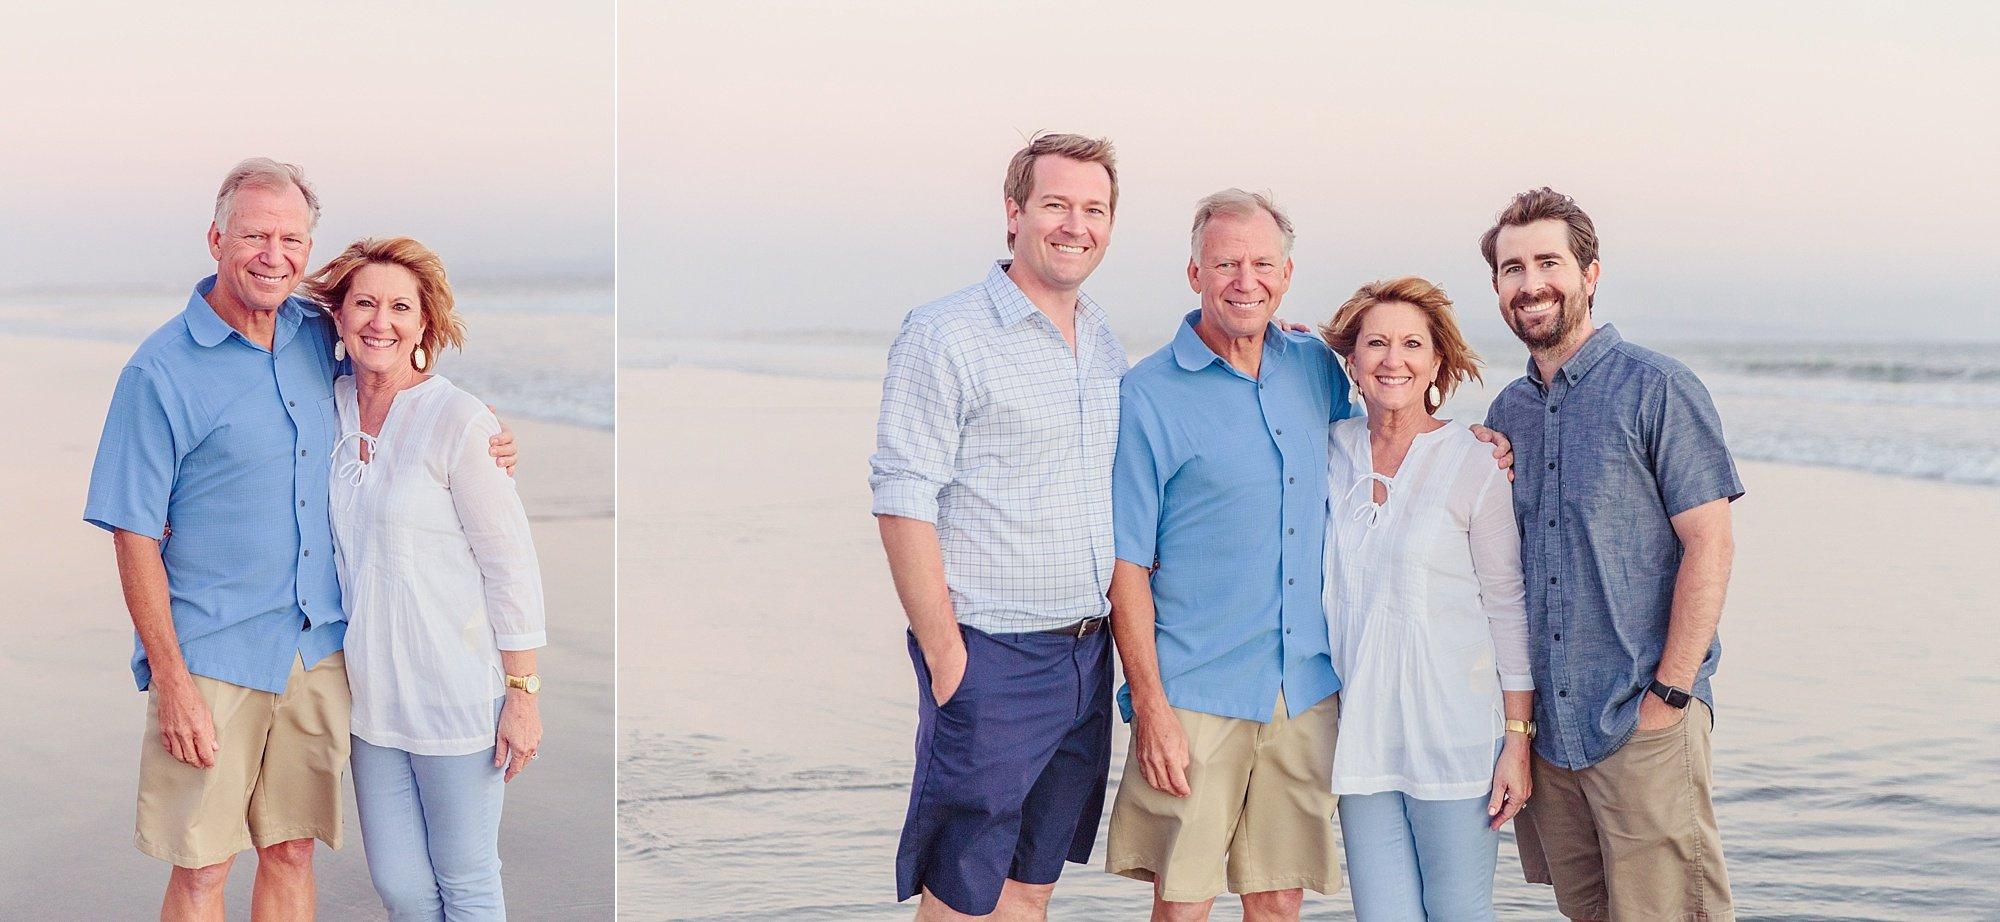 Extended Family Coronado Photographer | Beach Pictures